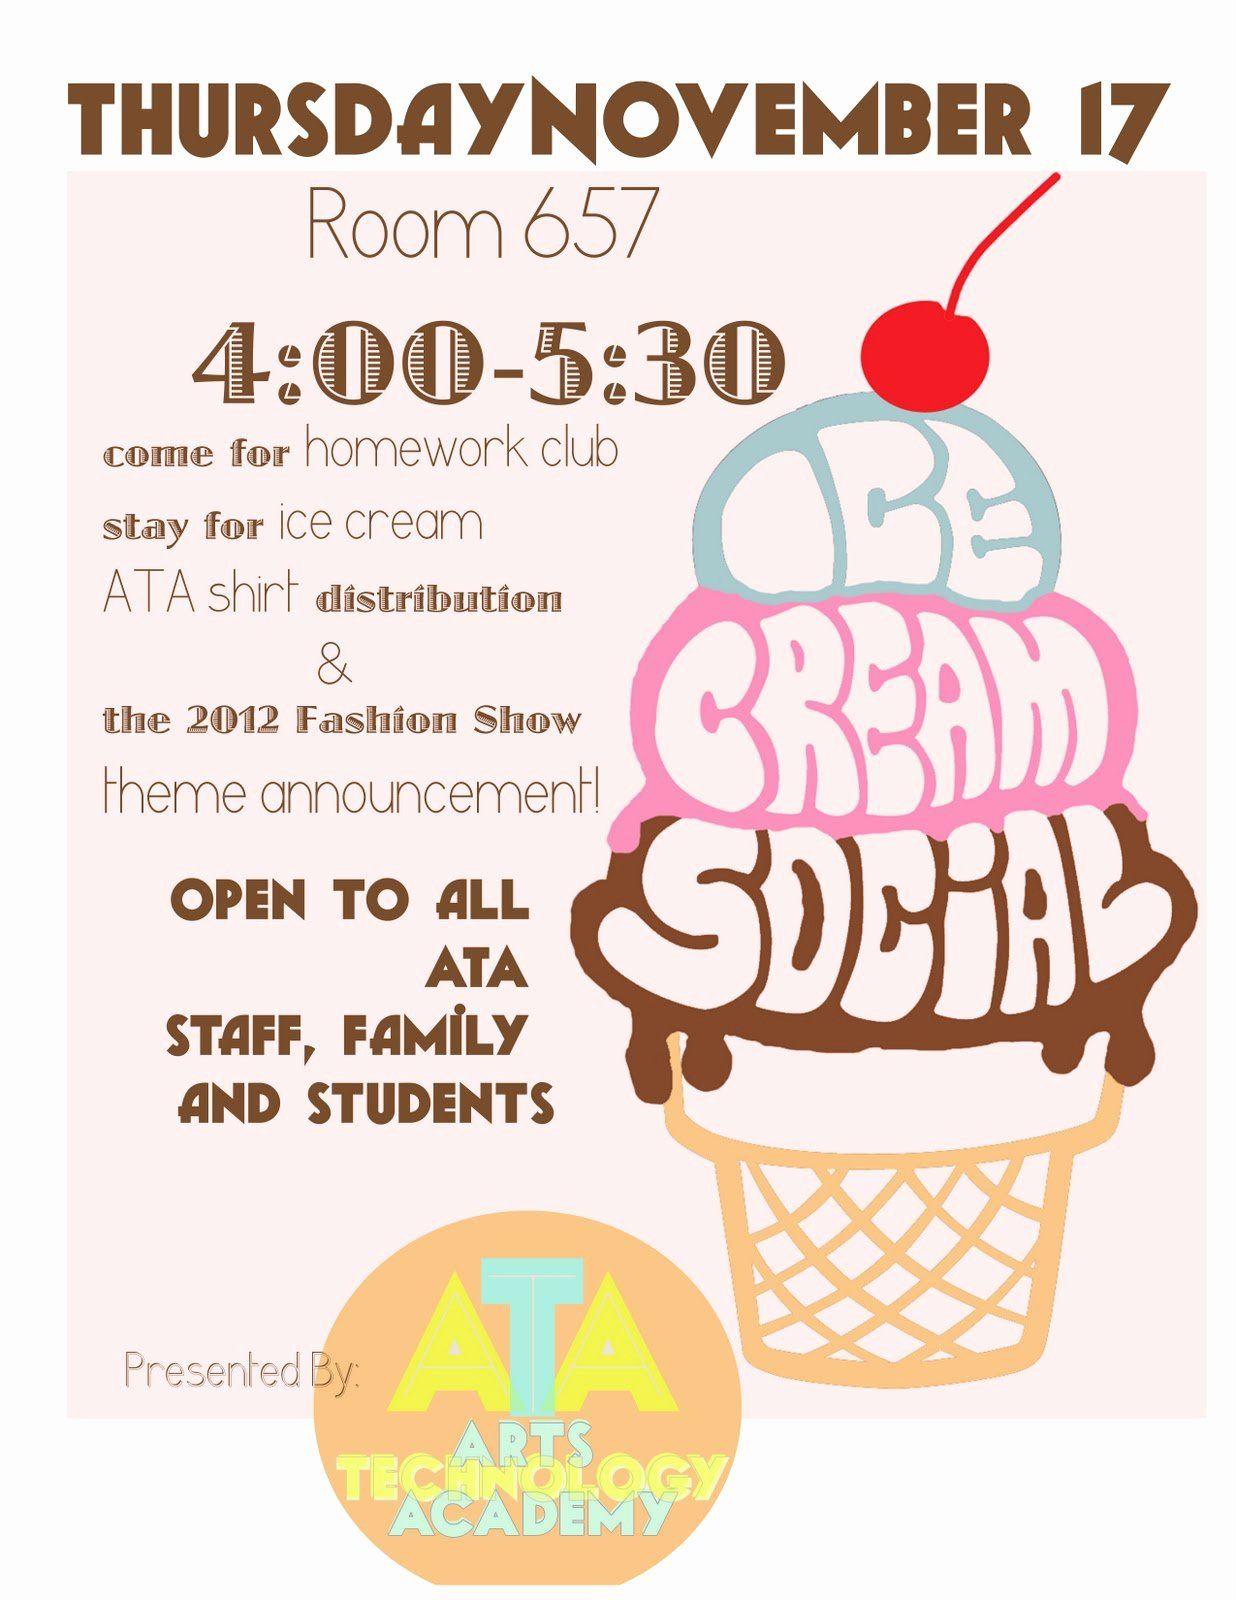 Free Ice Cream Social Flyer Template Elegant Free Ice Cream Social Invites Ice Cream Social Ice Cream Social Invitations Ice Cream Business